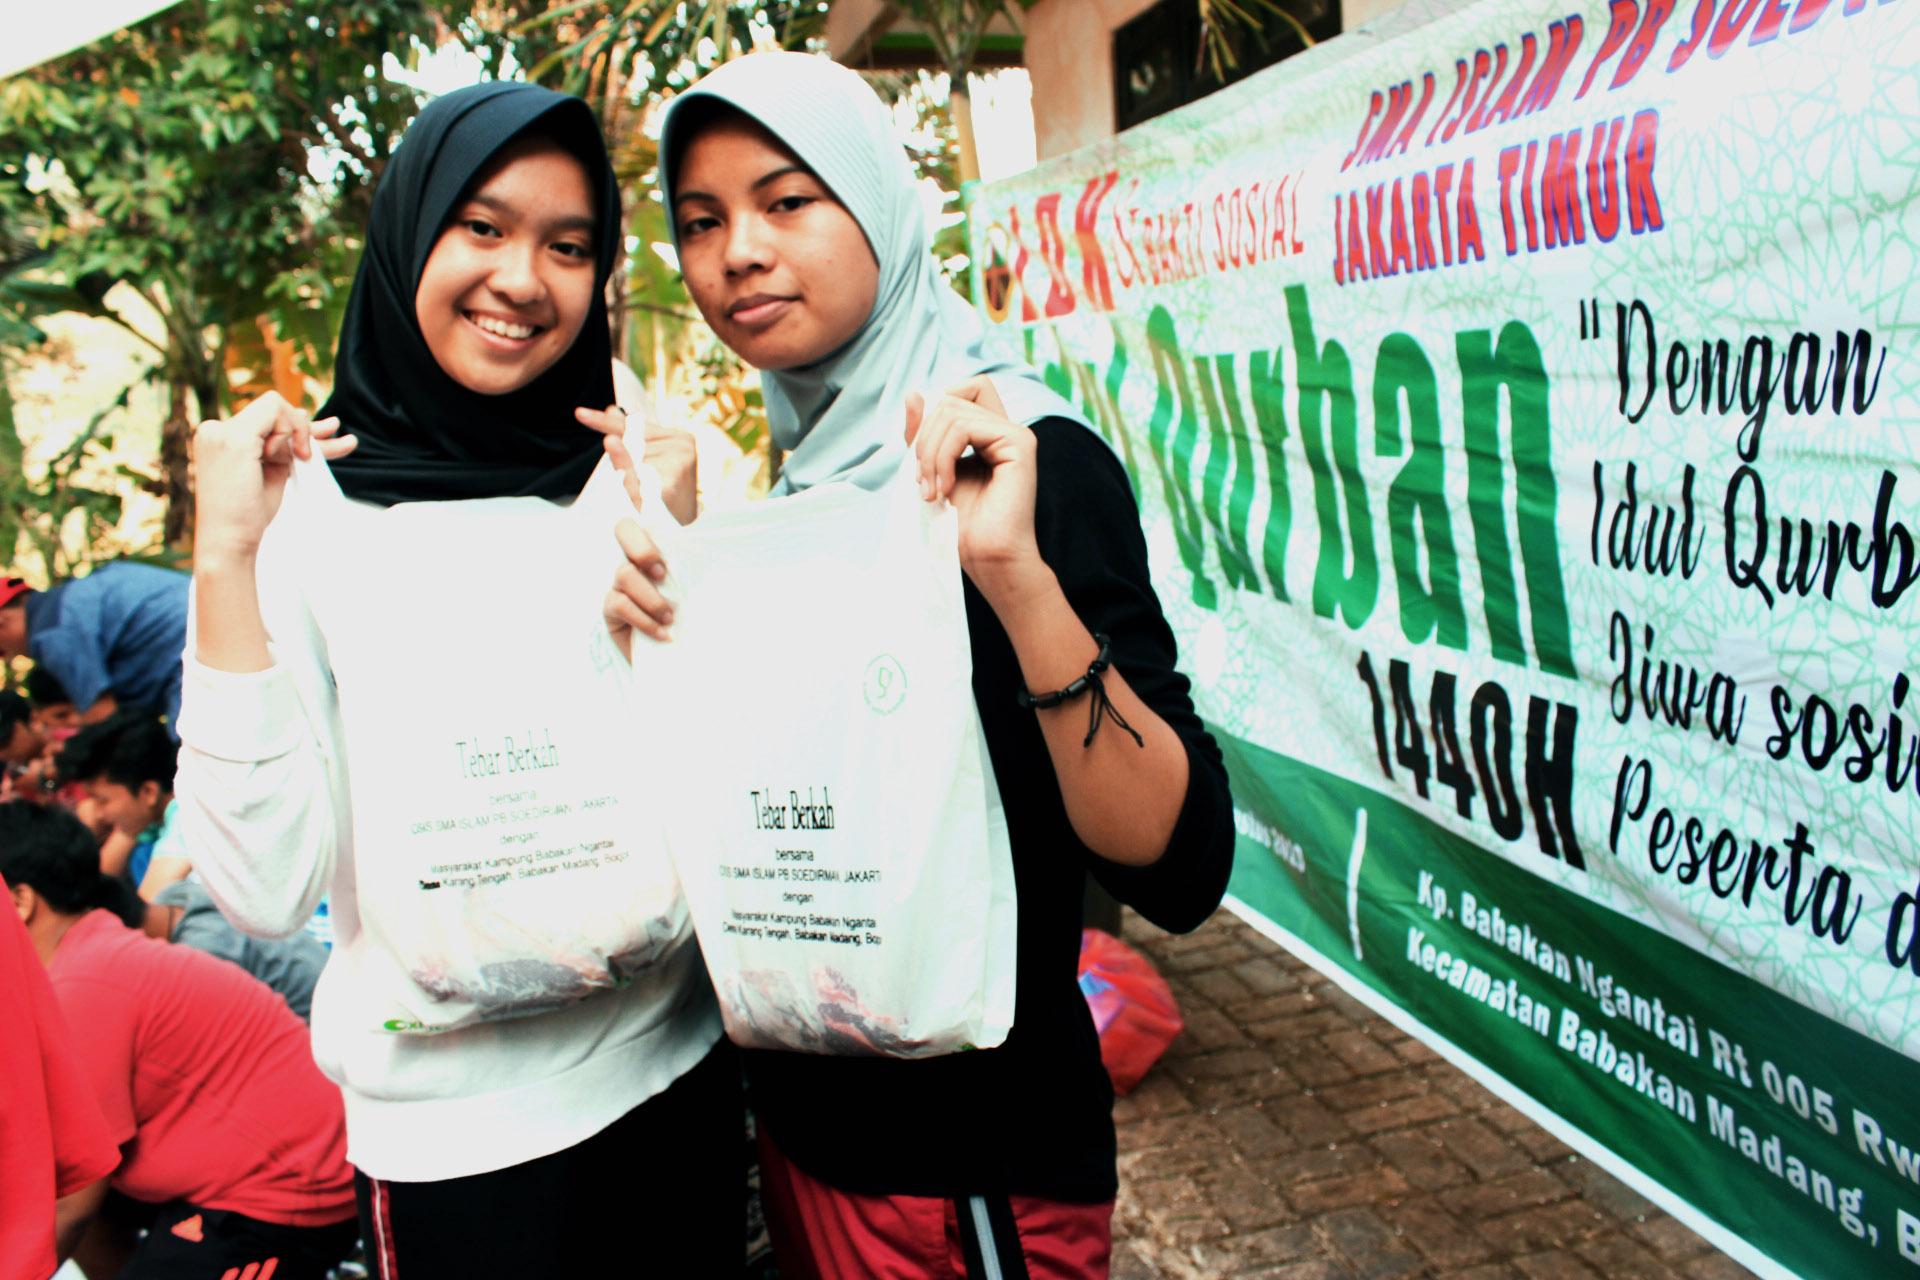 Bakti Sosial Idul Qurban di Desa Karang Tengah Babakan Madang Jawa Barat